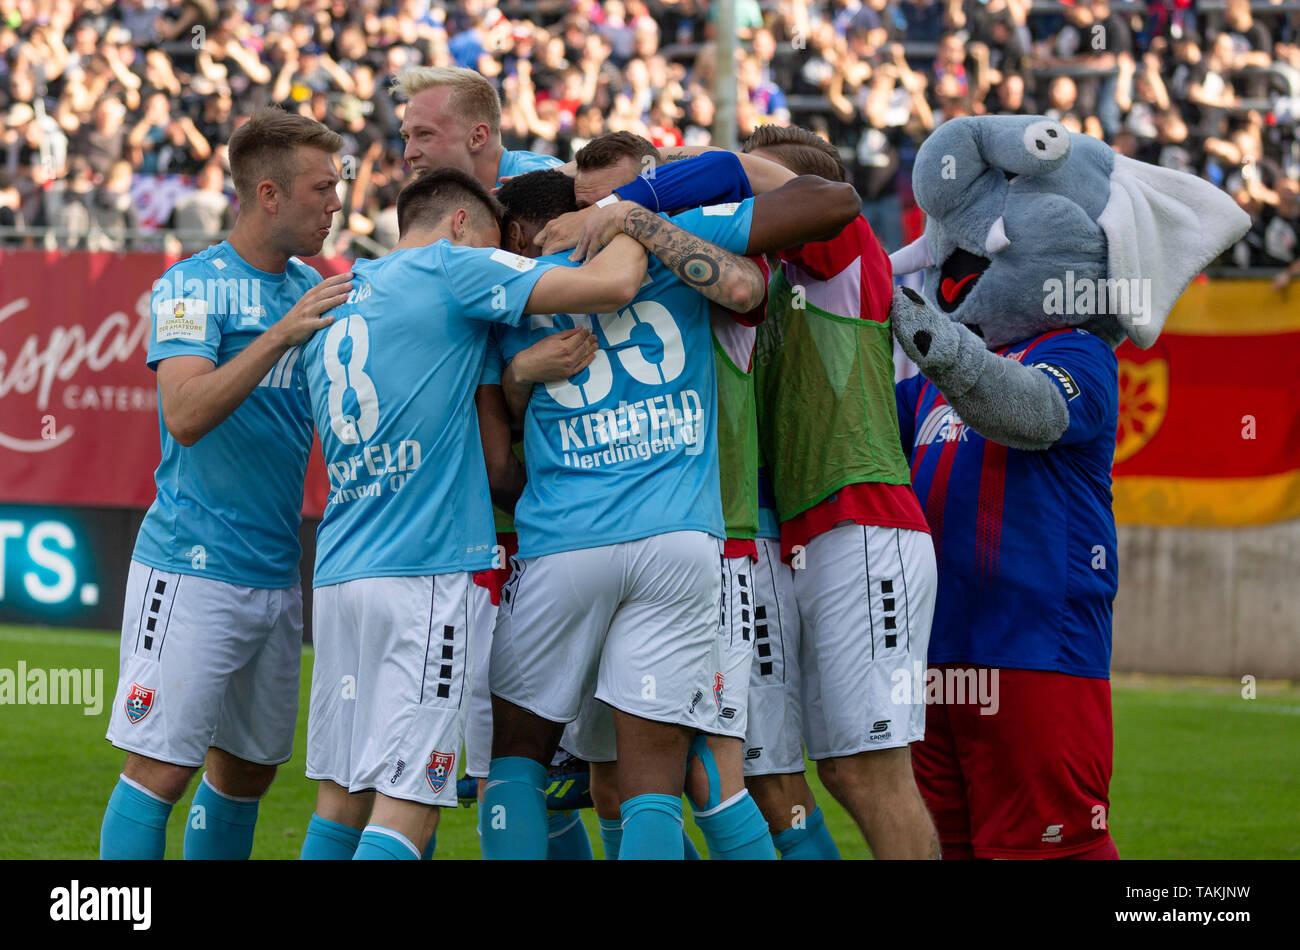 Sport, Fussball, Reviersport Niederrheinpokal, 2018/2019, Finale, Wuppertaler SV vs. KFC Uerdingen 1-2, Stadion Am Zoo in Wuppertal, Torjubel nach dem Siegtor zum 1-2, v.l.n.r. Connor Krempicki (KFC), Maurice Jerome Litka (KFC), Patrick Pfluecke (KFC), Torschuetze Osayamen Osawe (KFC), Maskottchen Grotifant, sports, football, Lower Rhine Cup, 2018/2019, final, Wuppertaler SV vs. KFC Uerdingen 1-2, Stadium Am Zoo in Wuppertal, rejoicing at the 1-2 winning goal, f.l.t.r. Connor Krempicki (KFC), Maurice Jerome Litka (KFC), Patrick Pfluecke (KFC), goal scorer Osayamen Osawe (KFC), mascot Grotifant - Stock Image